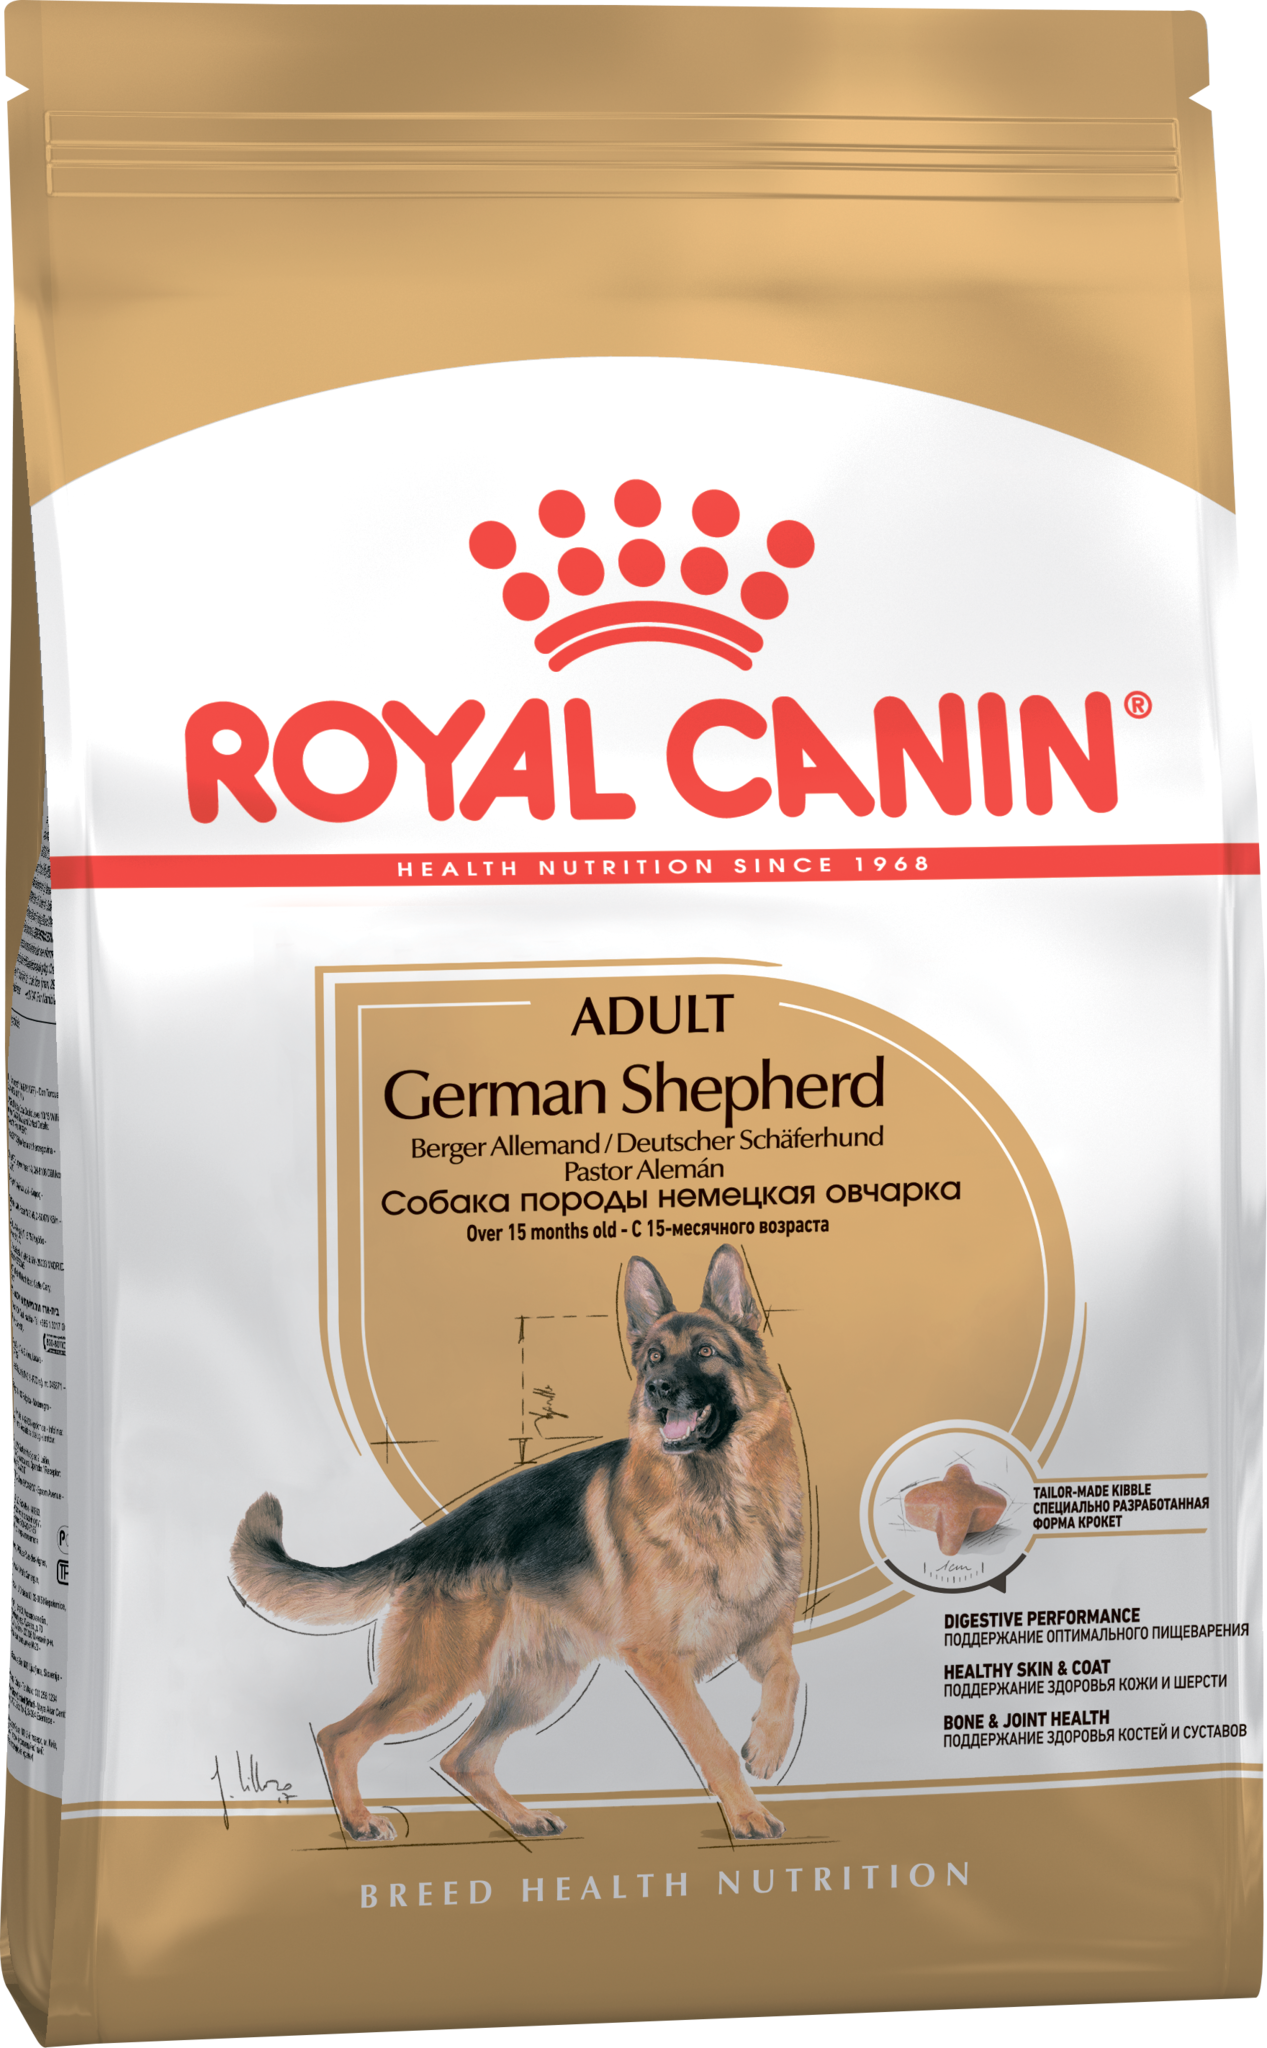 Royal Canin Корм для взрослых собак породы немецкая овчарка, Royal Canin German Shepherd Adult 342030.png